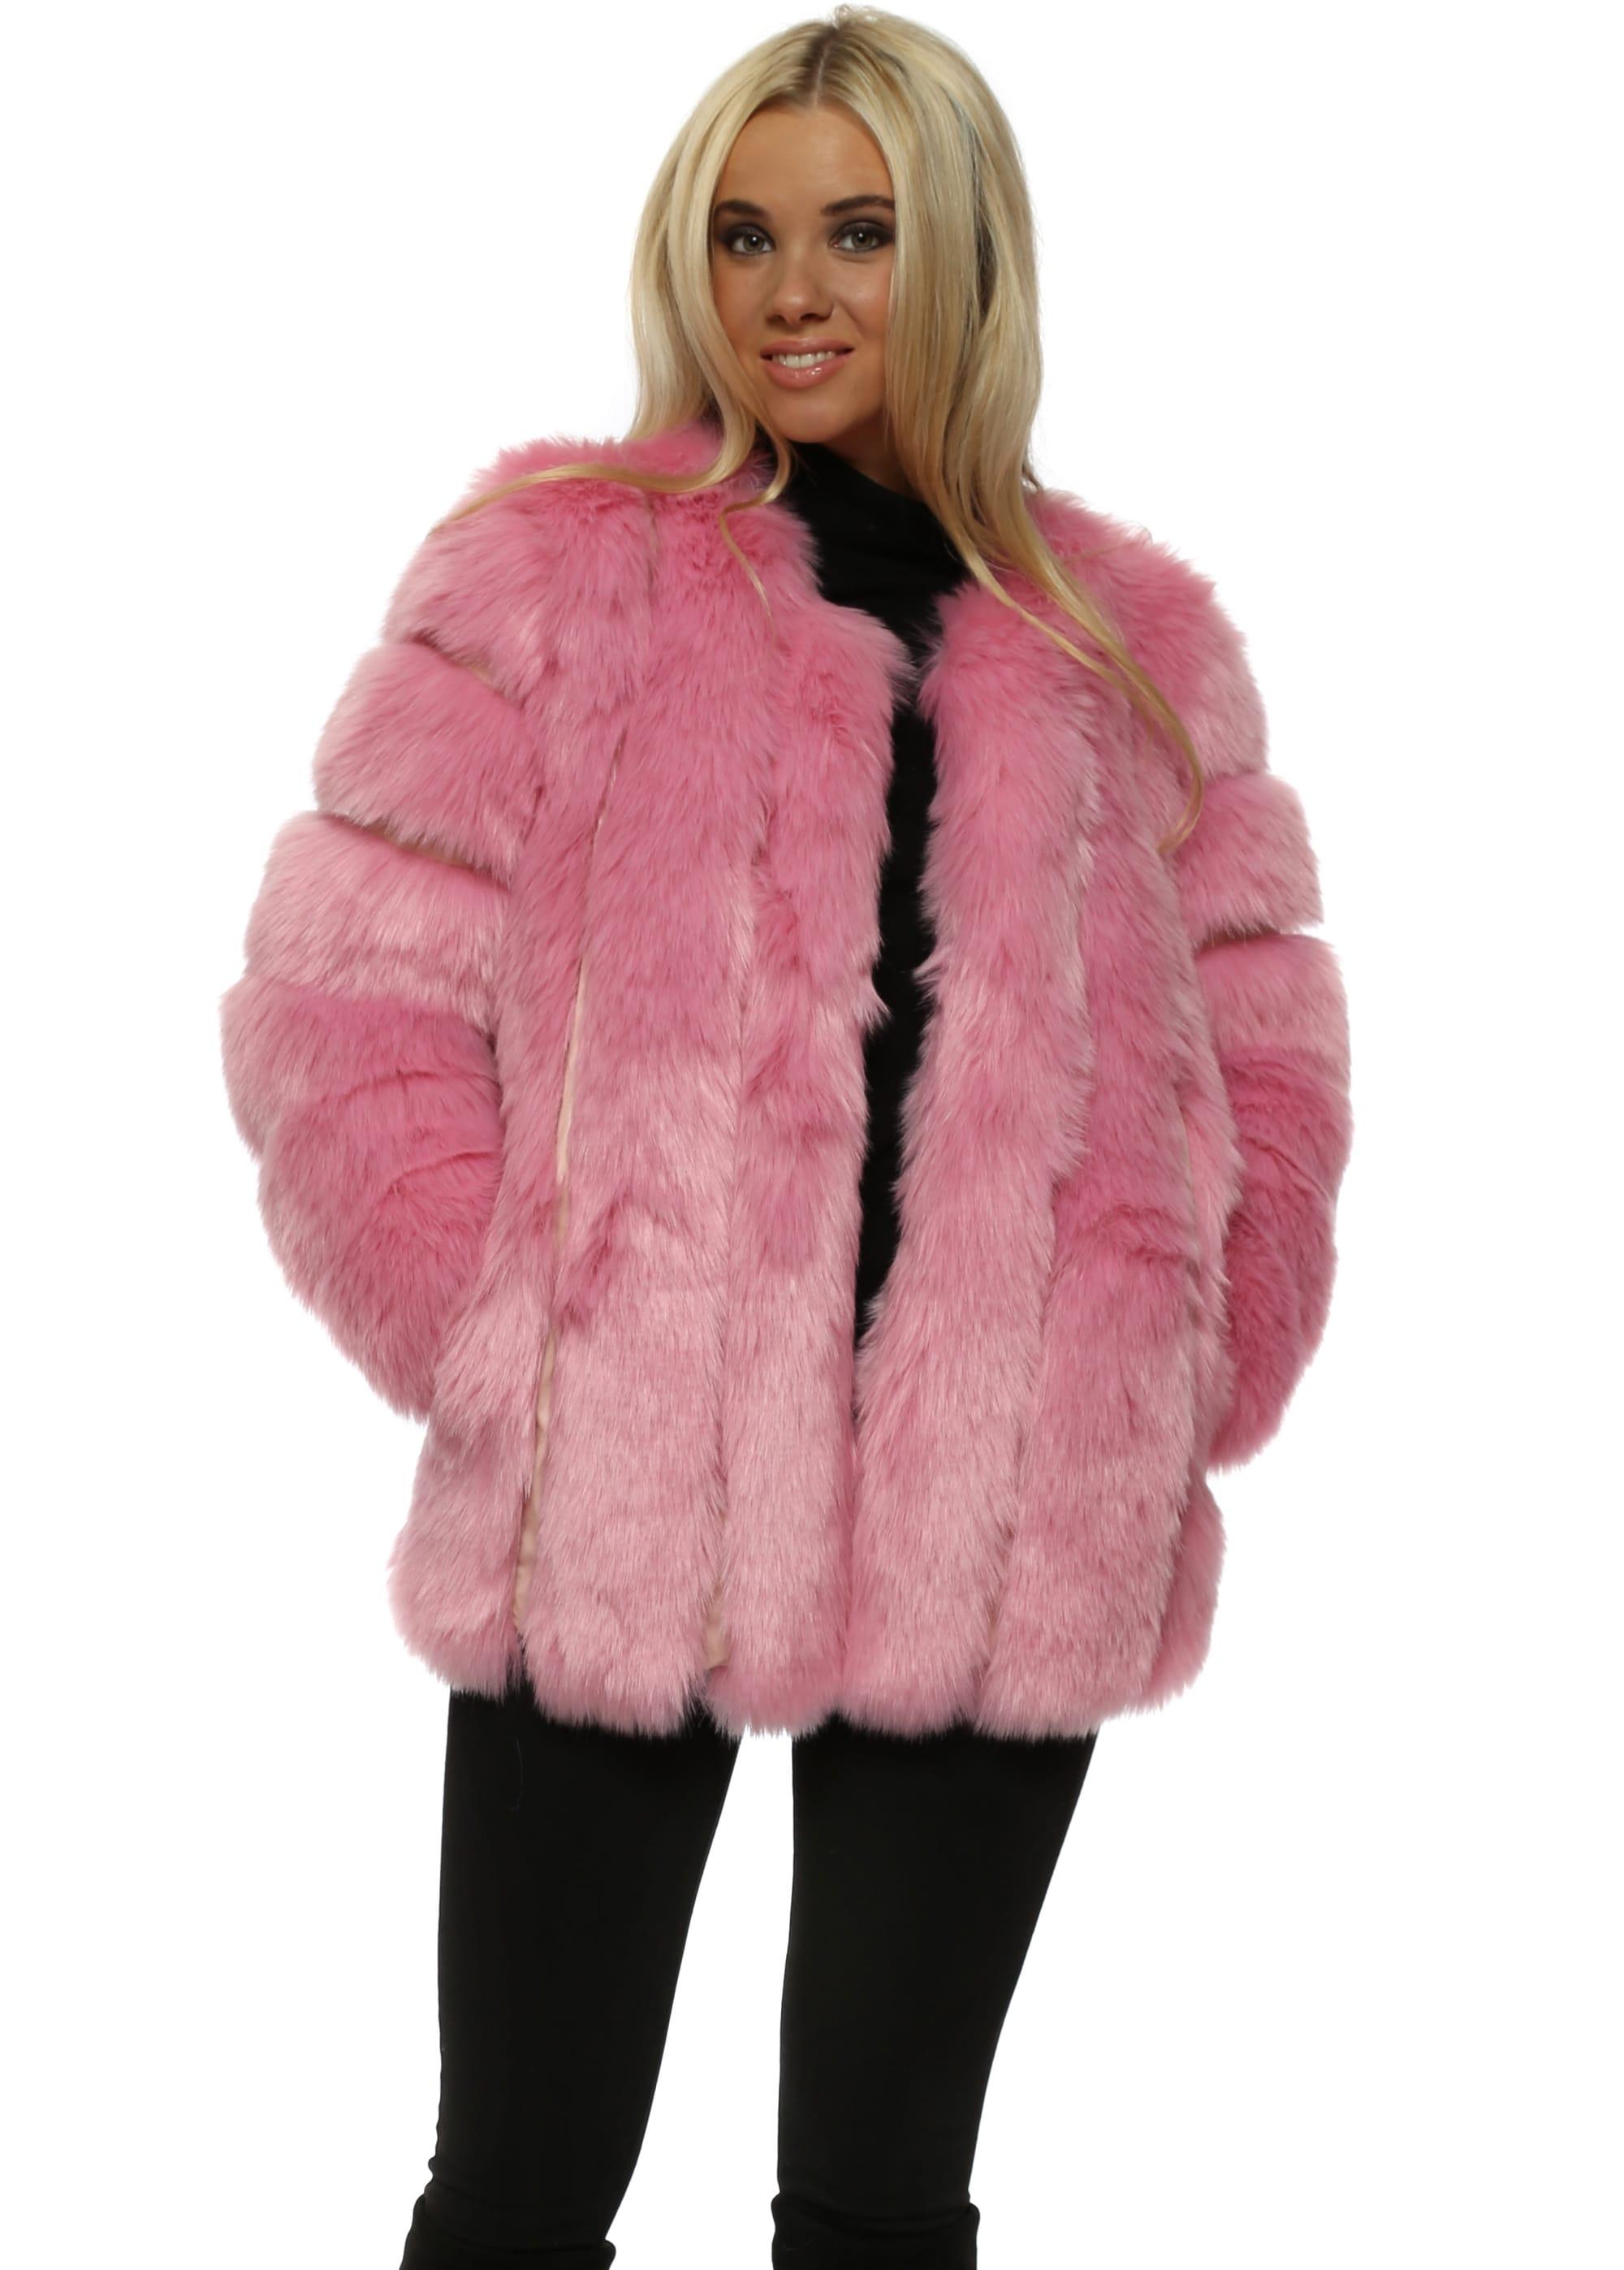 3fae08f01 Renaissance Candy Pink Luxe Faux Fur Coat